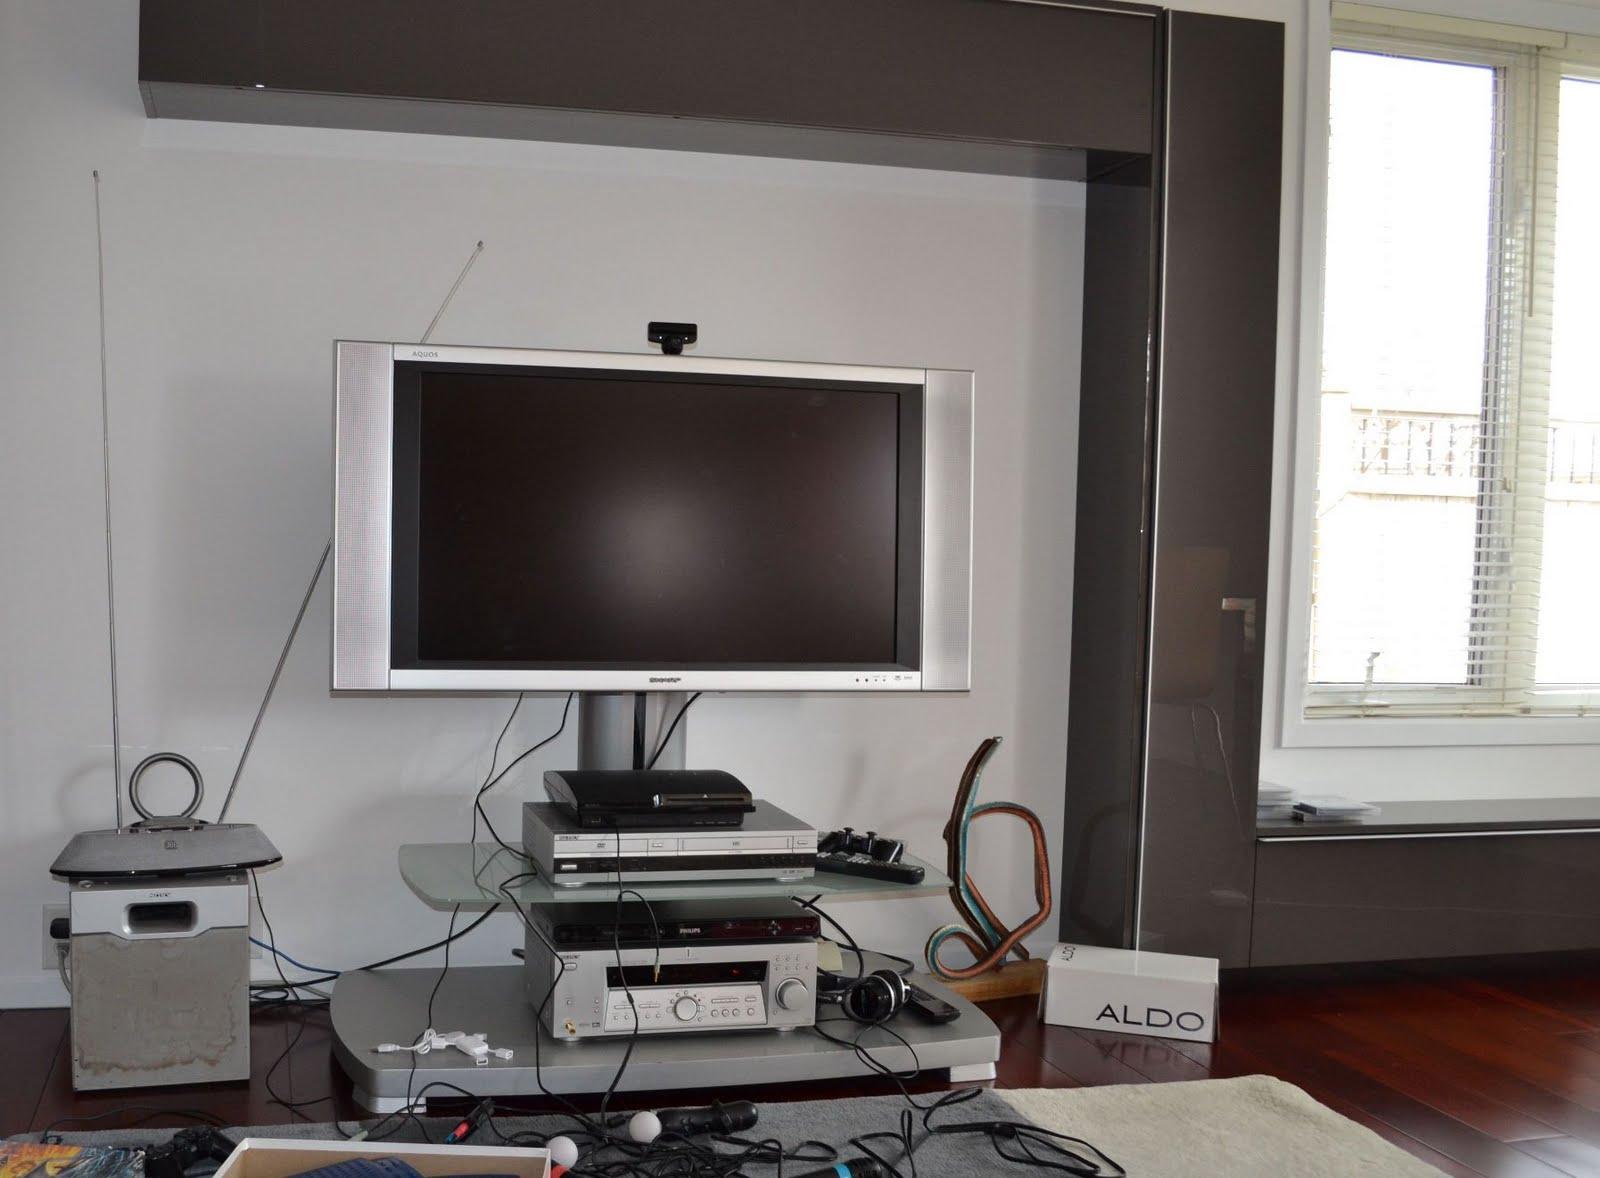 Yarial Com Ikea Besta Burs Tv Unit Hack Interessante Ideen F R  # Ikea Meuble Tv Besta Burs